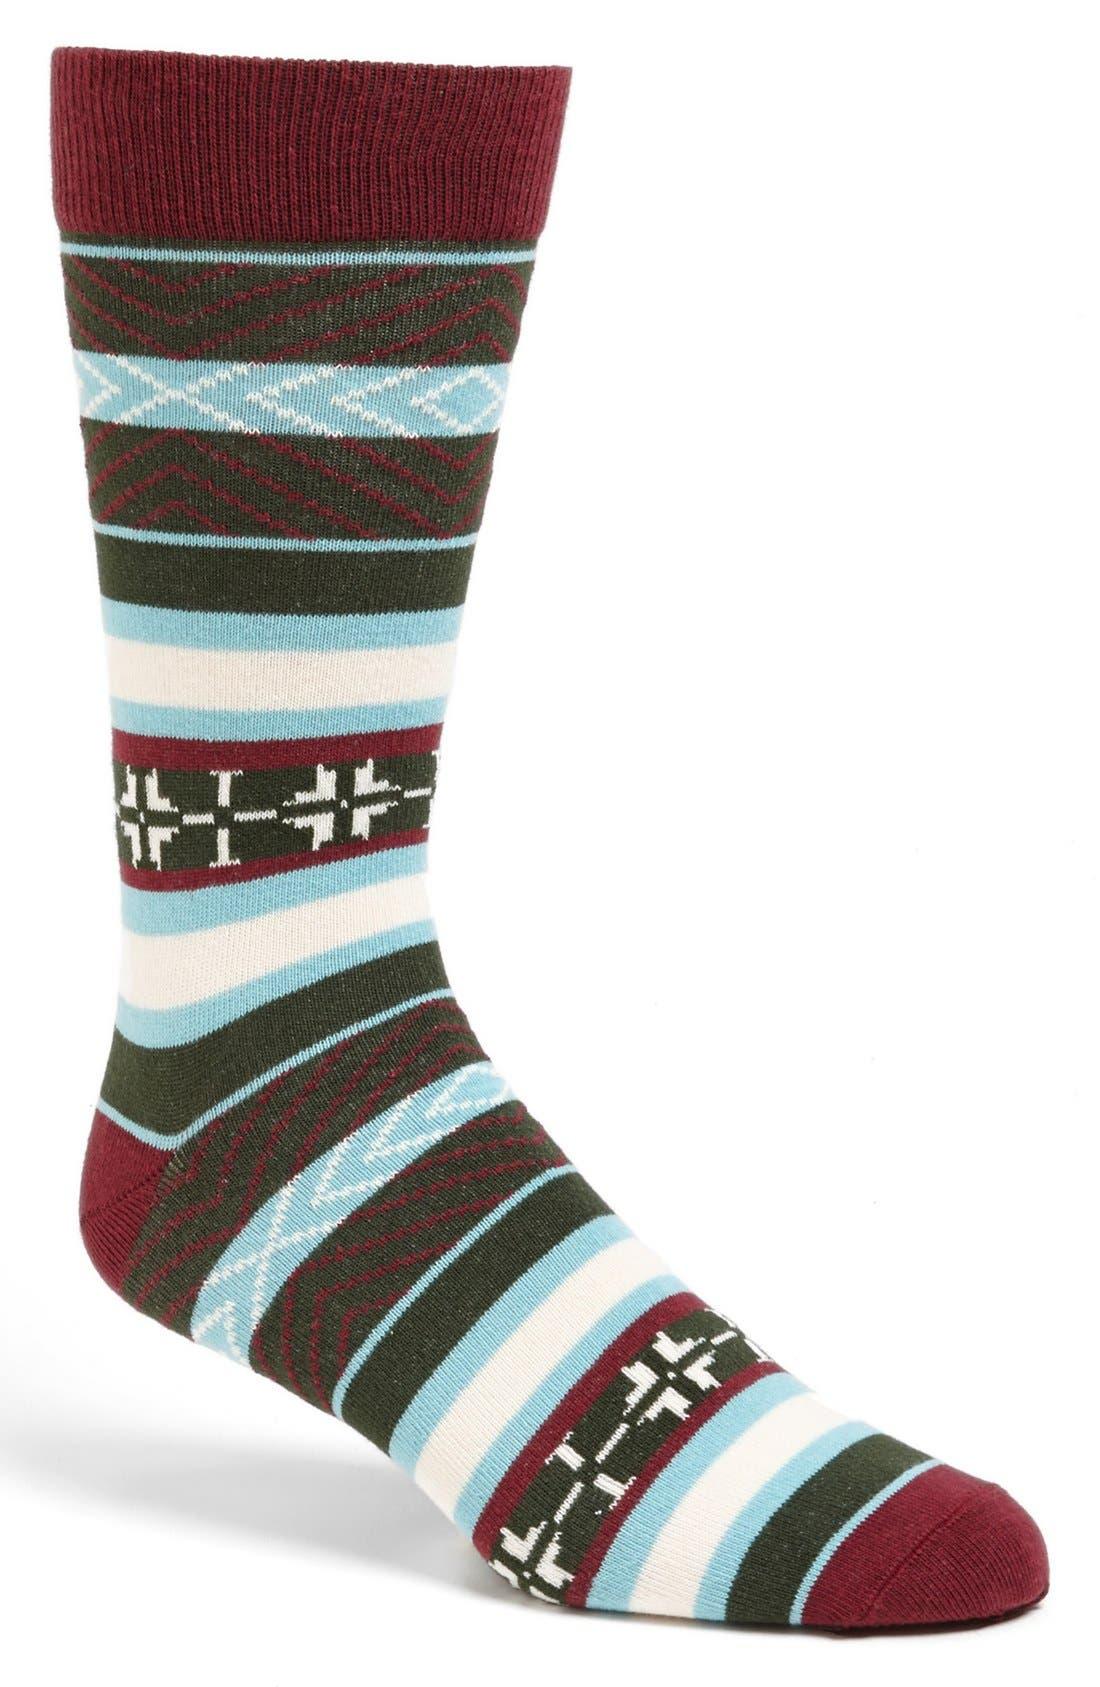 Alternate Image 1 Selected - Pact 'Fair Isle' Crew Socks